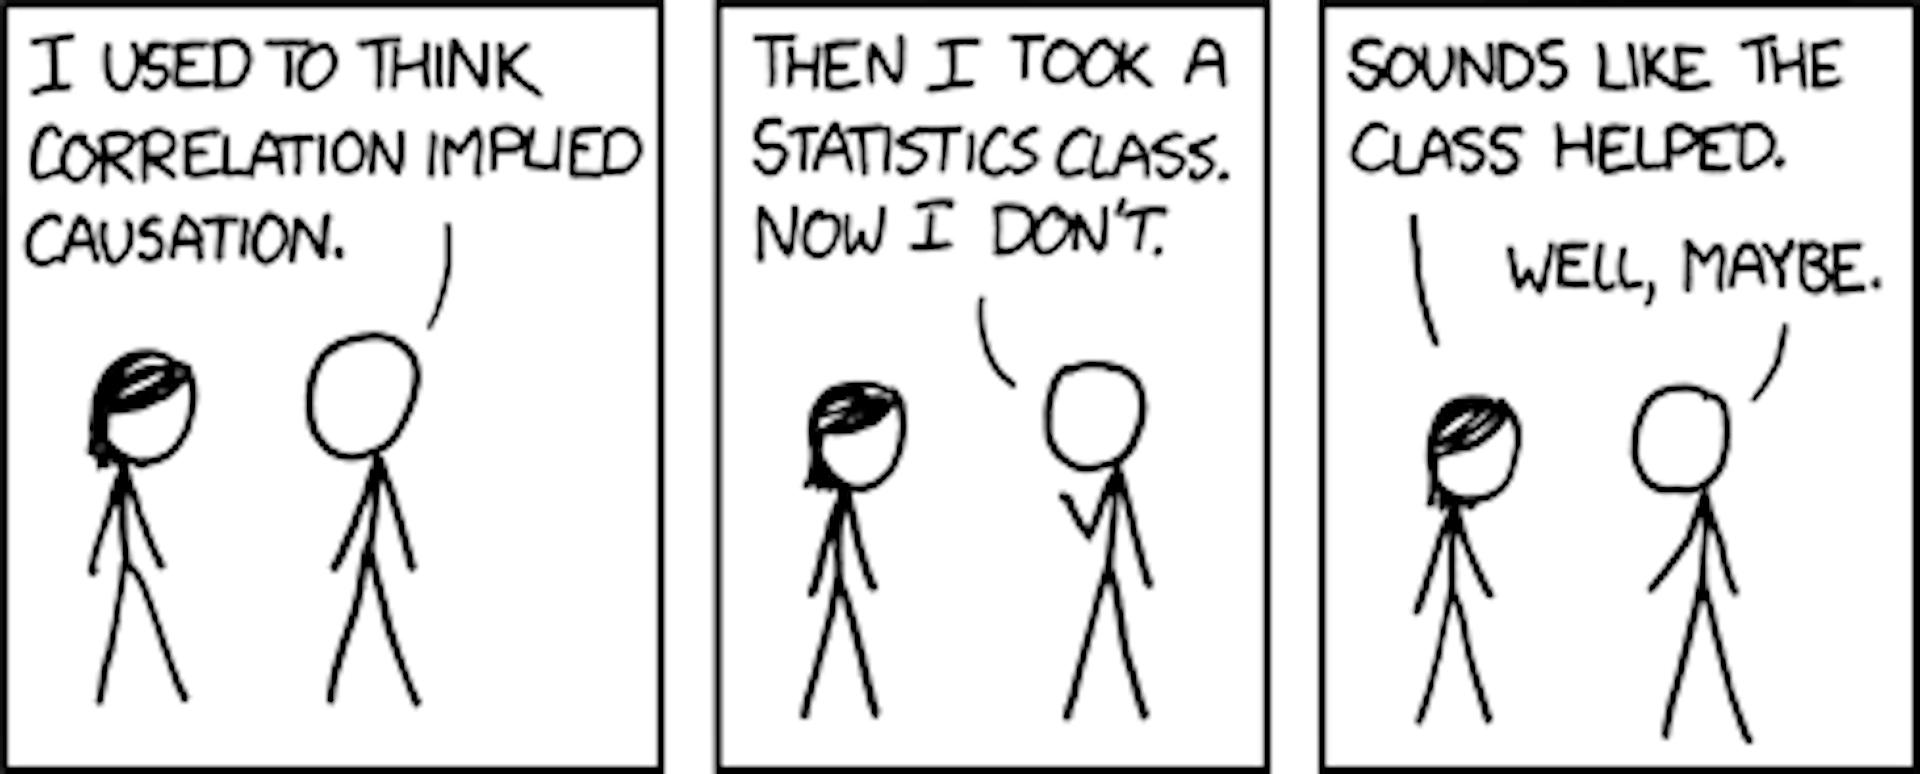 Correlation imply causation